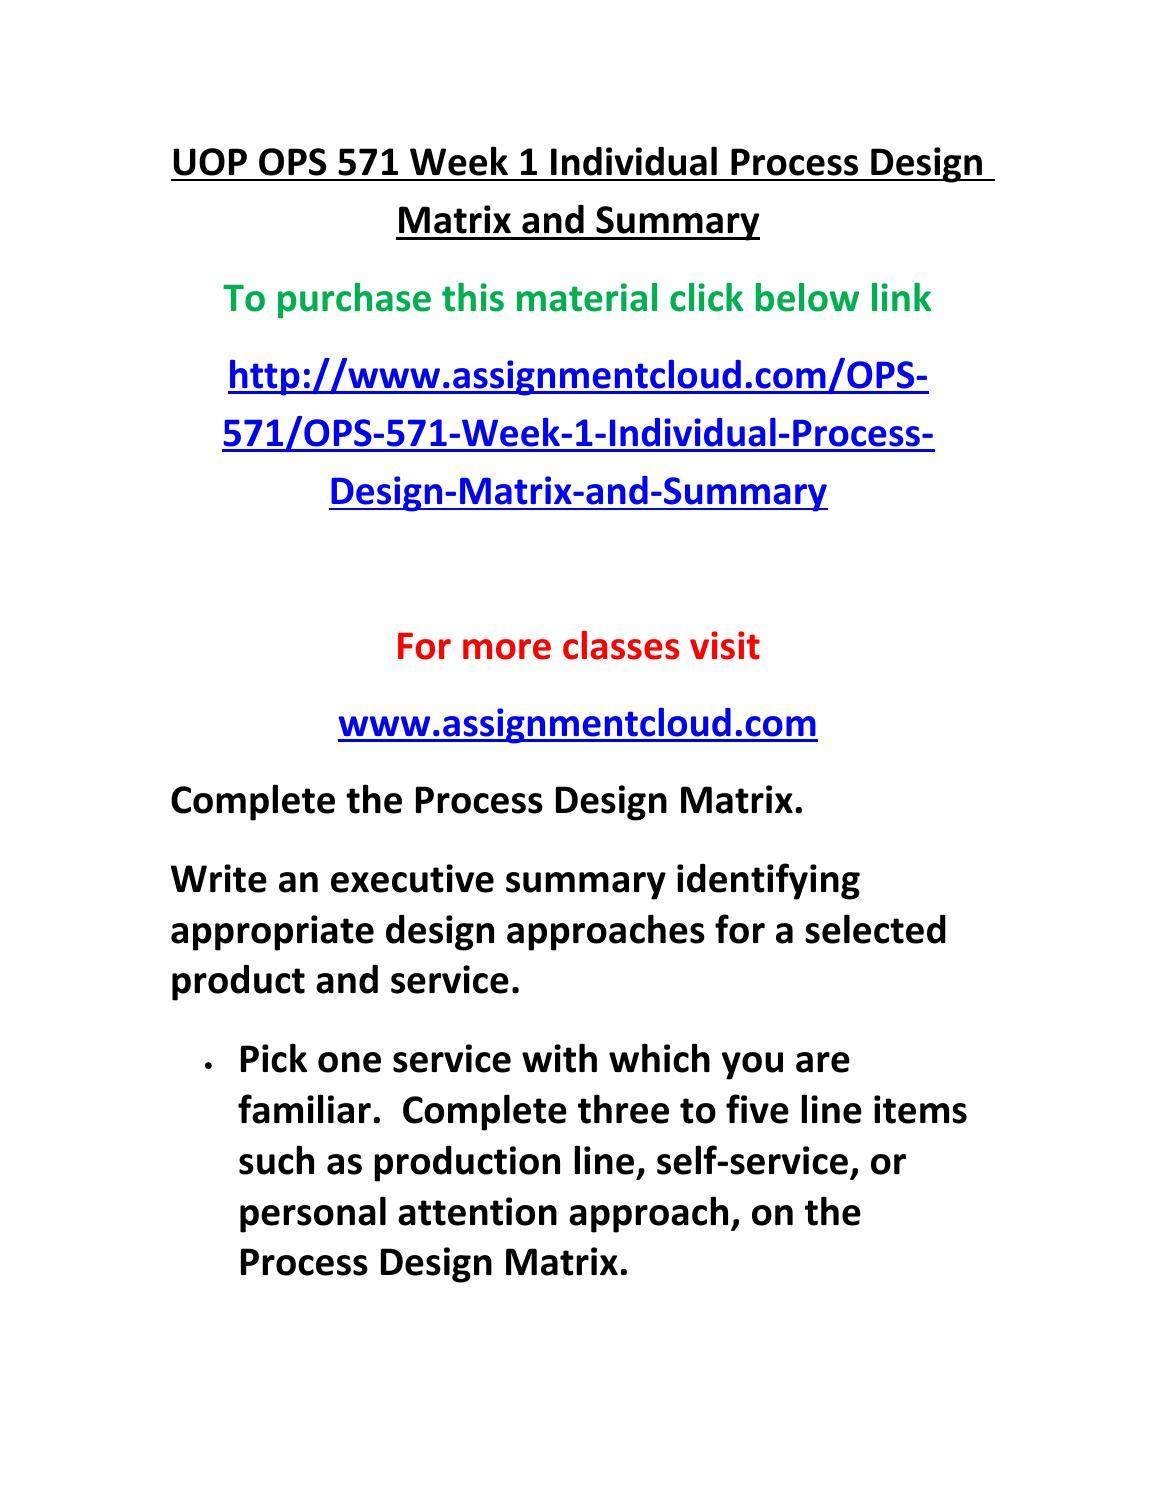 Executive summary process design matrix